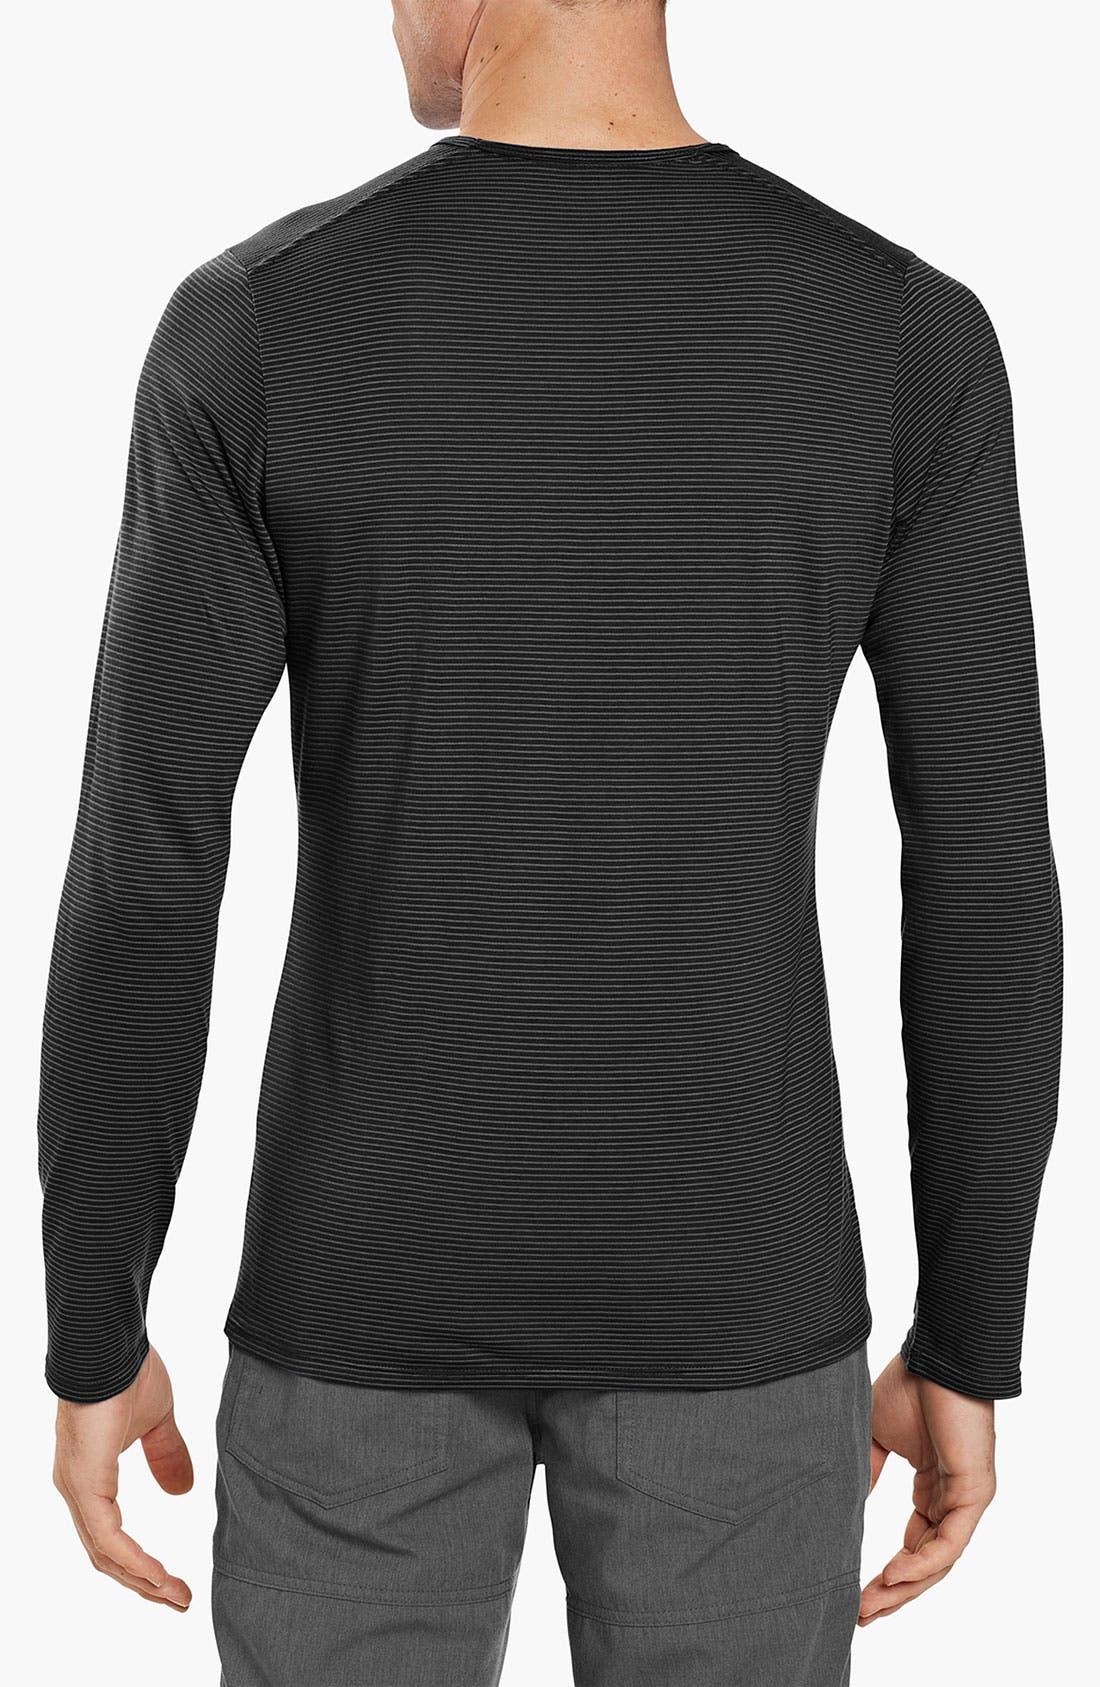 Alternate Image 2  - Nau 'Ayre' Long Sleeve T-Shirt